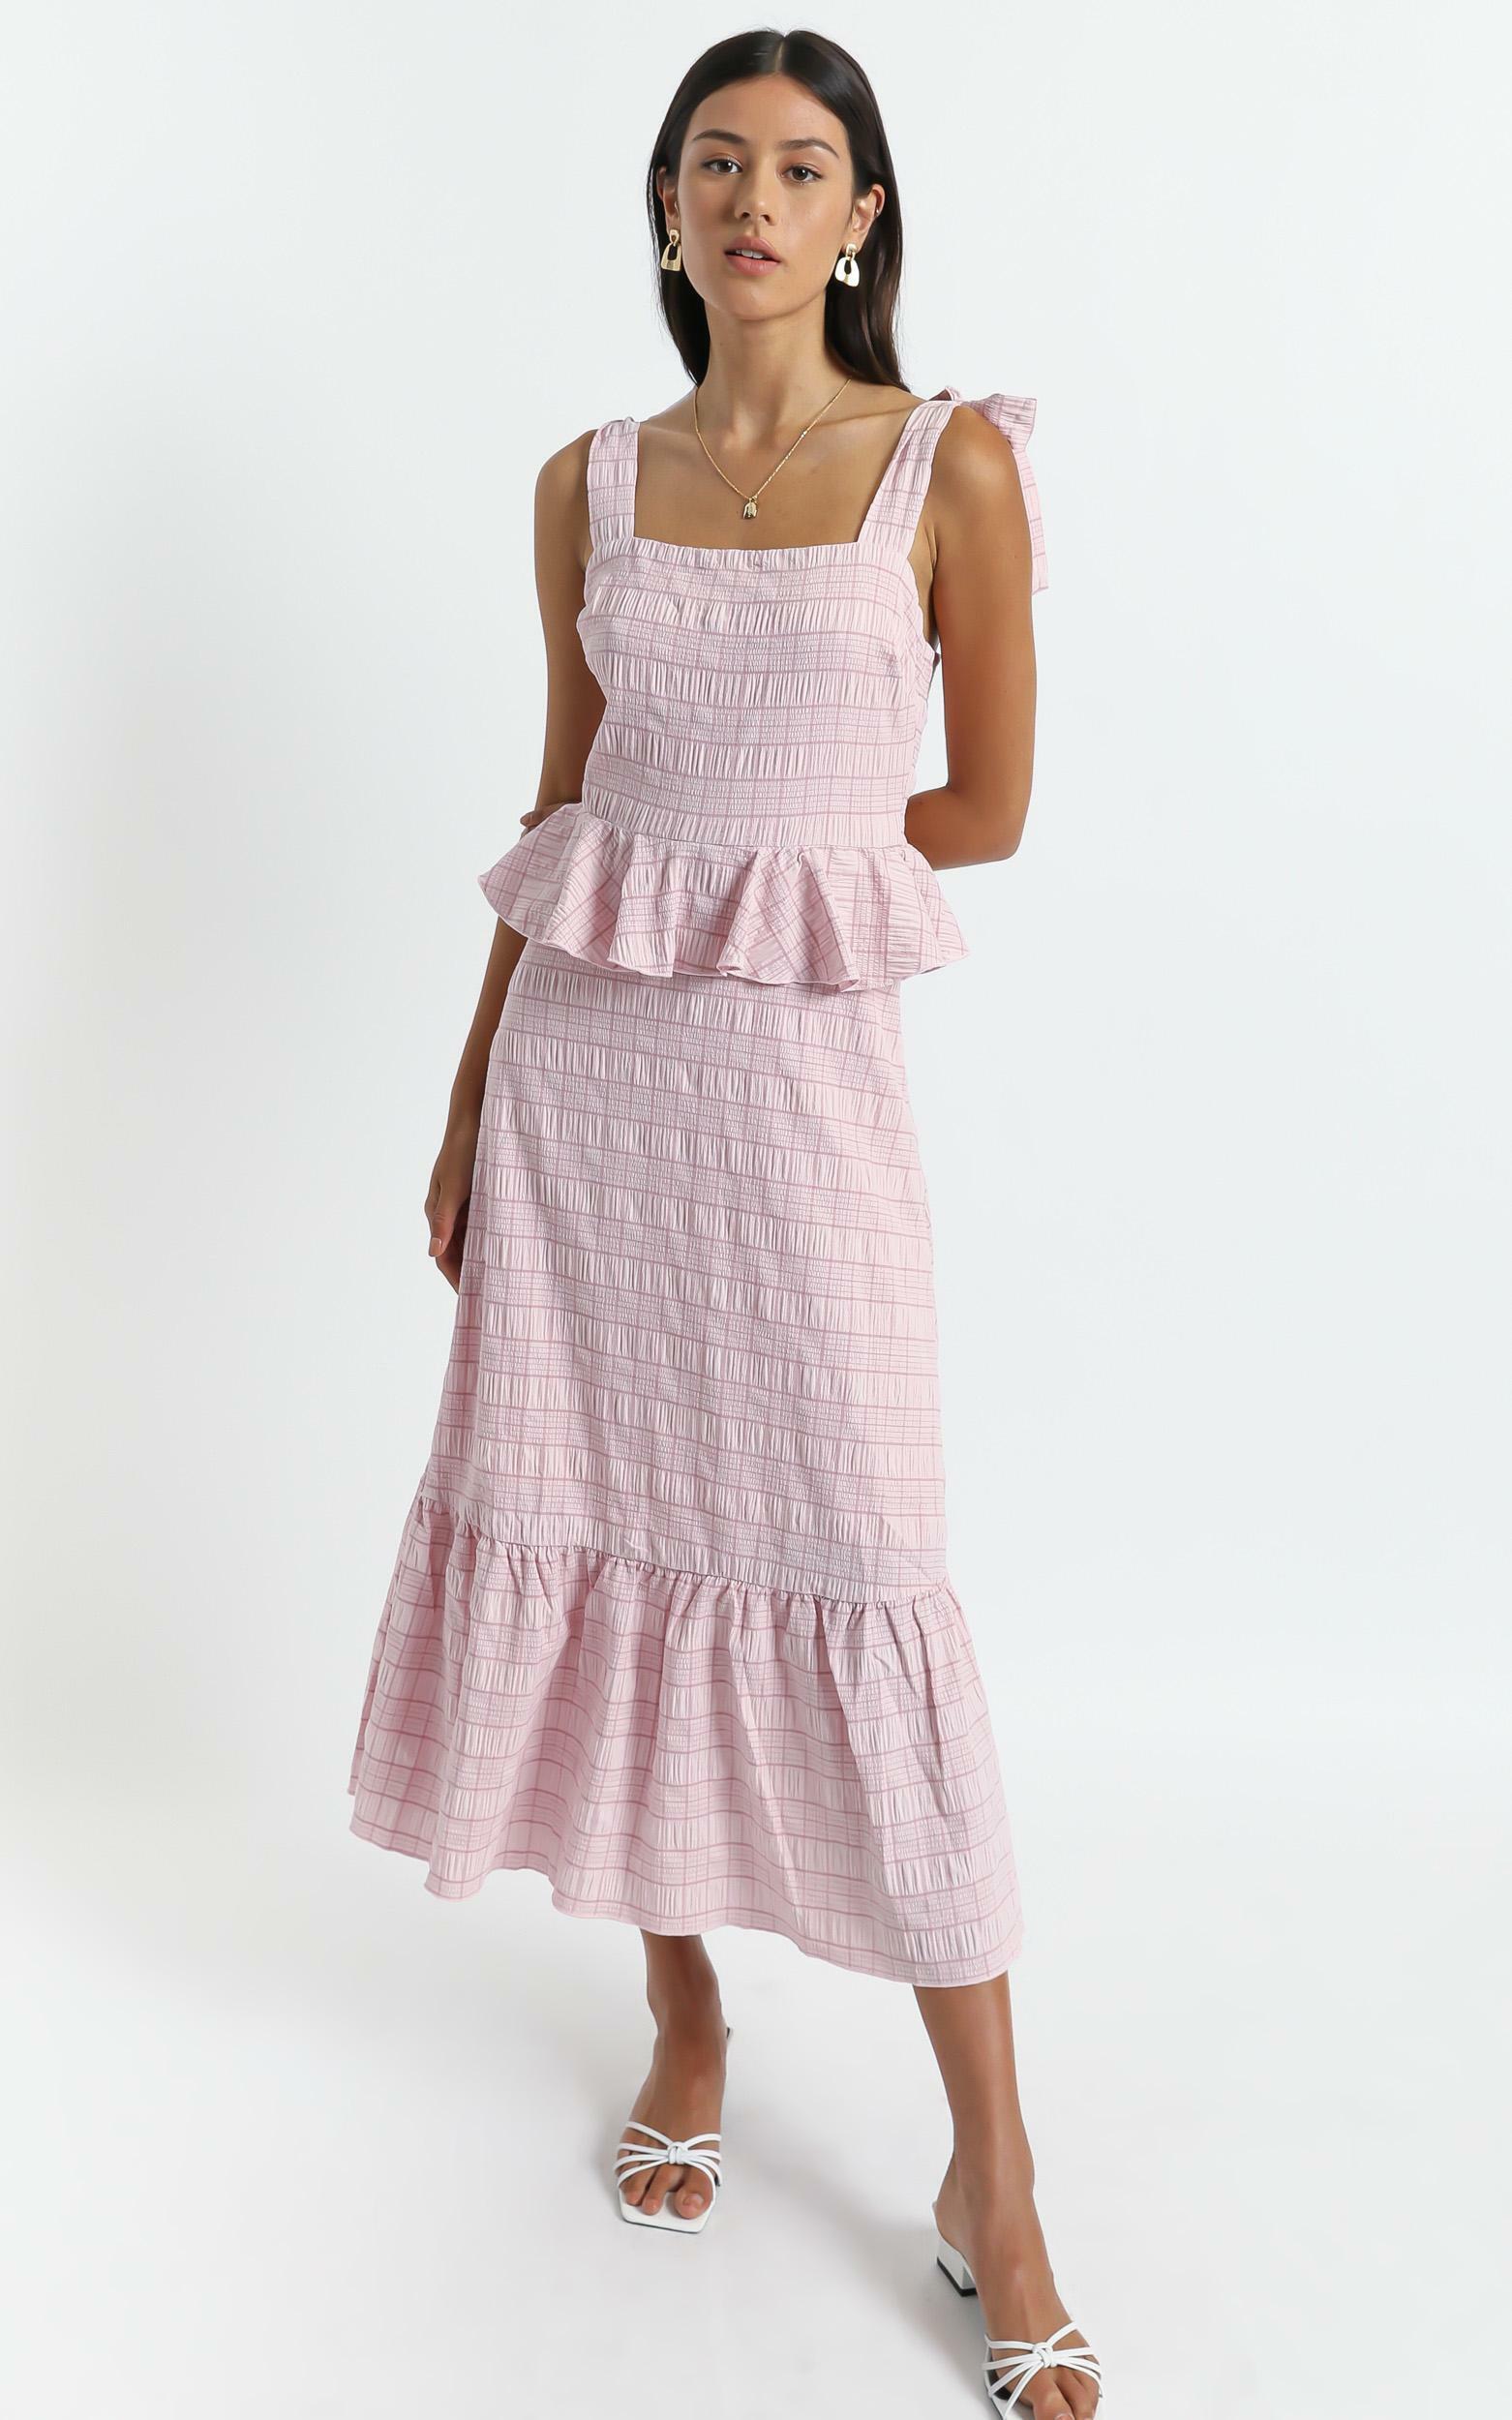 Alane Dress in Blush Check - 6 (XS), Blush, hi-res image number null